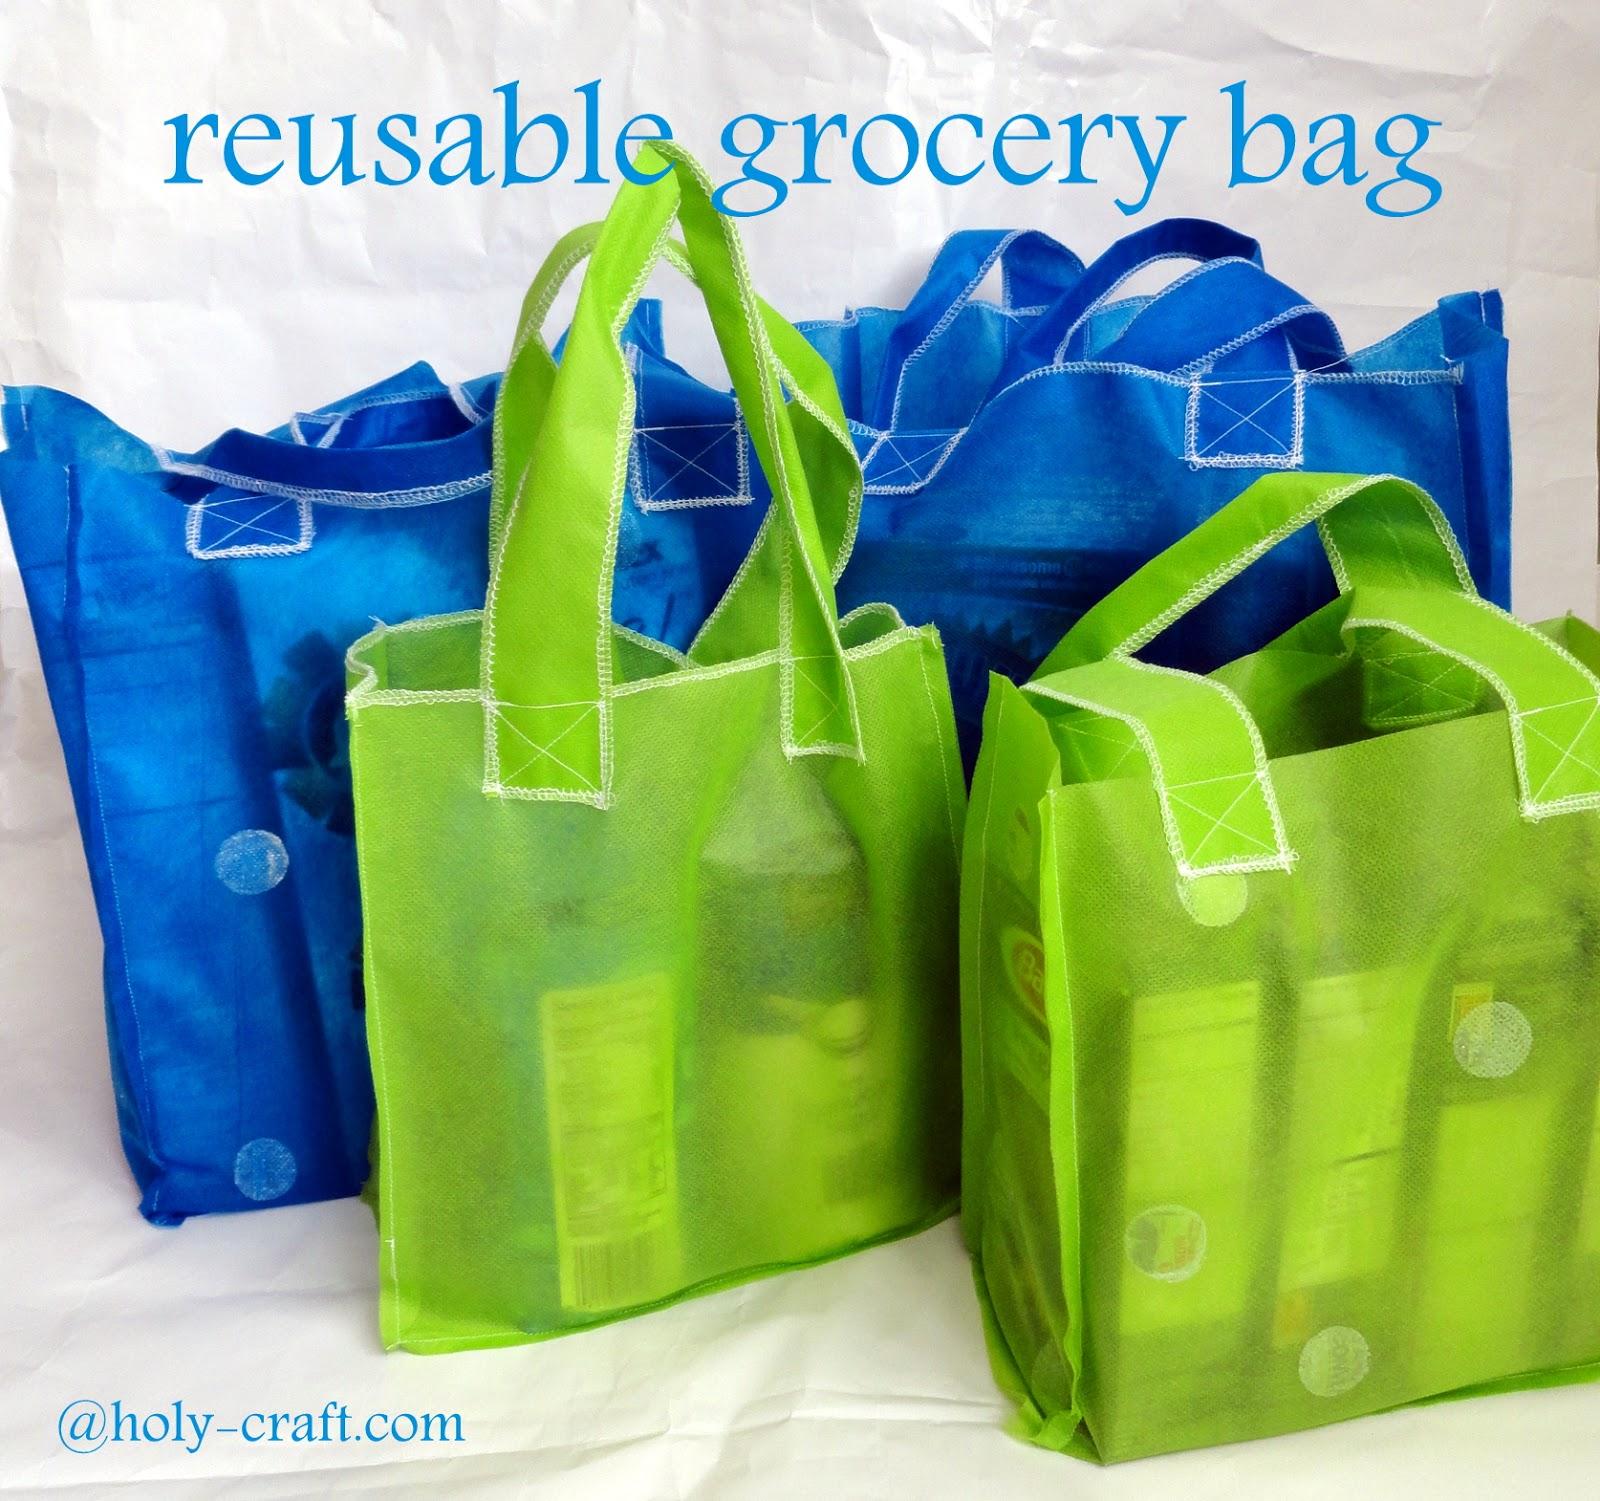 http://1.bp.blogspot.com/-J7PrkyZpVOs/UxT5xGVm69I/AAAAAAAAXuo/wnHpQJztp5Q/s1600/grocery+sack+tutorial.jpg